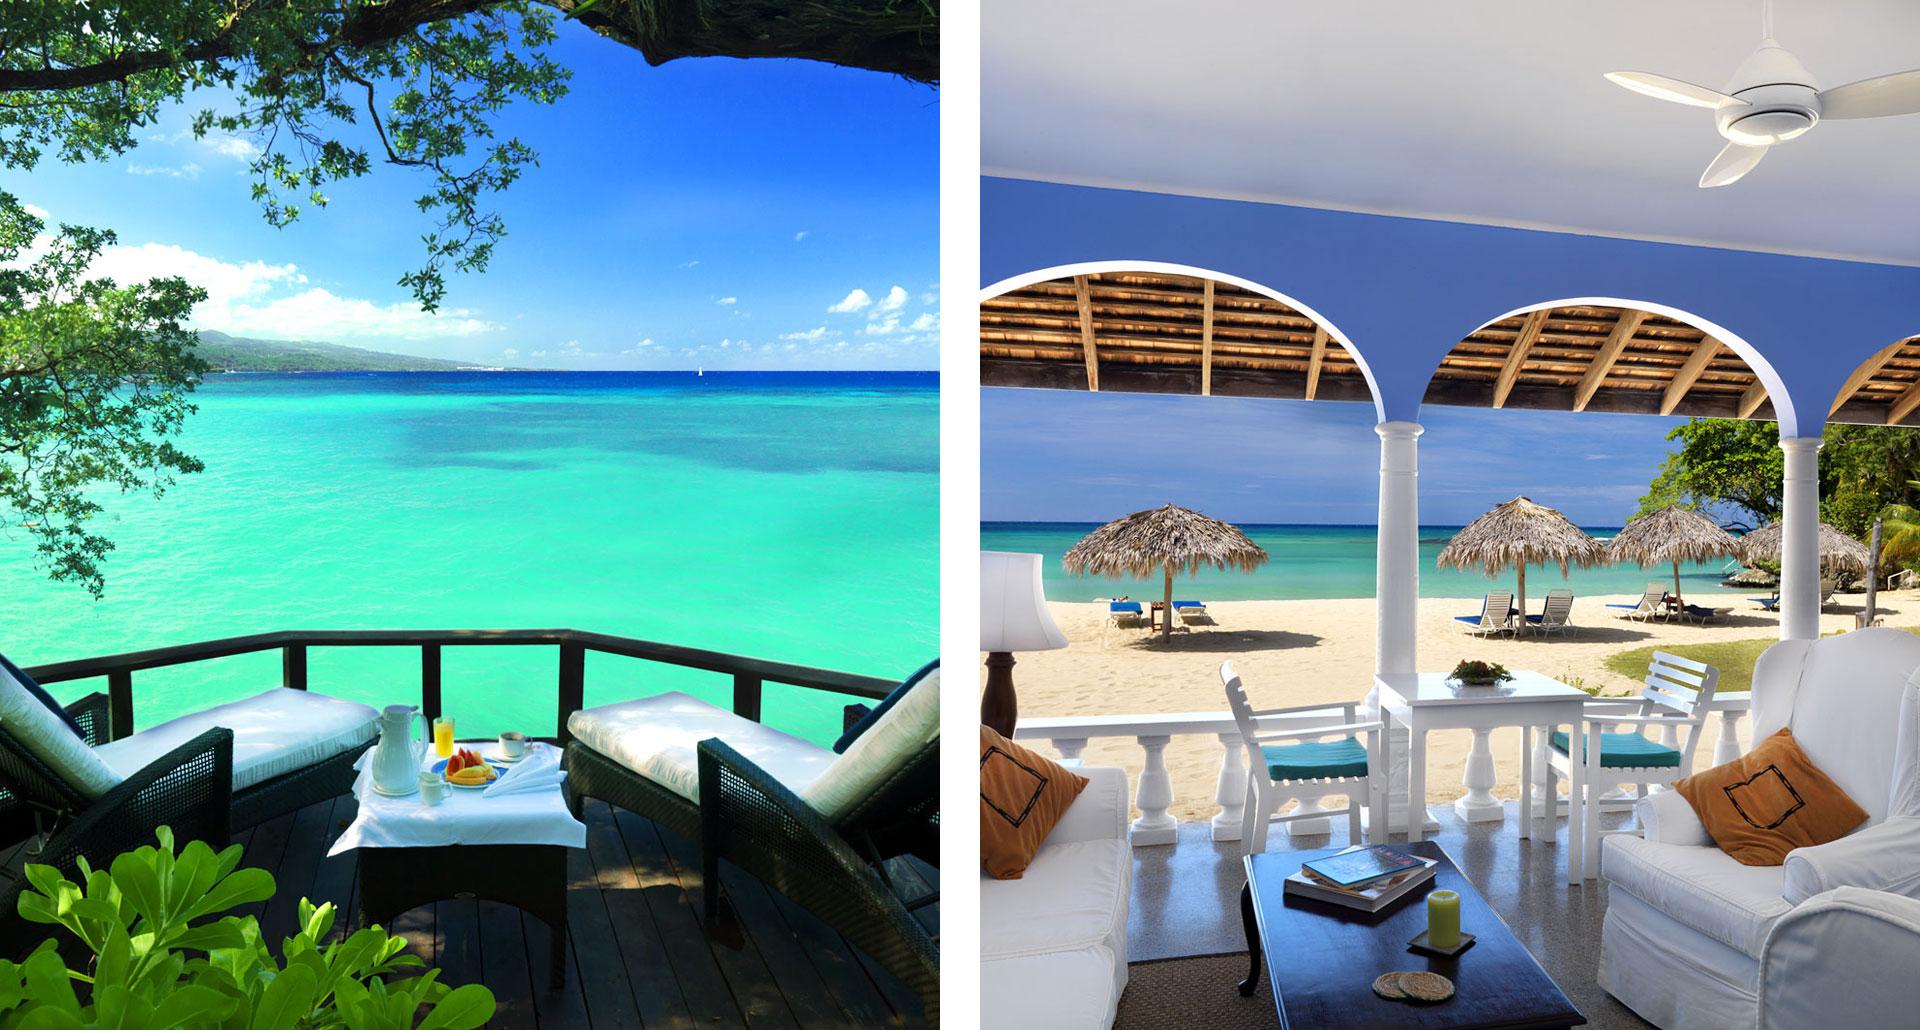 Jamaica Inn - boutique hotel in Ochos Rios